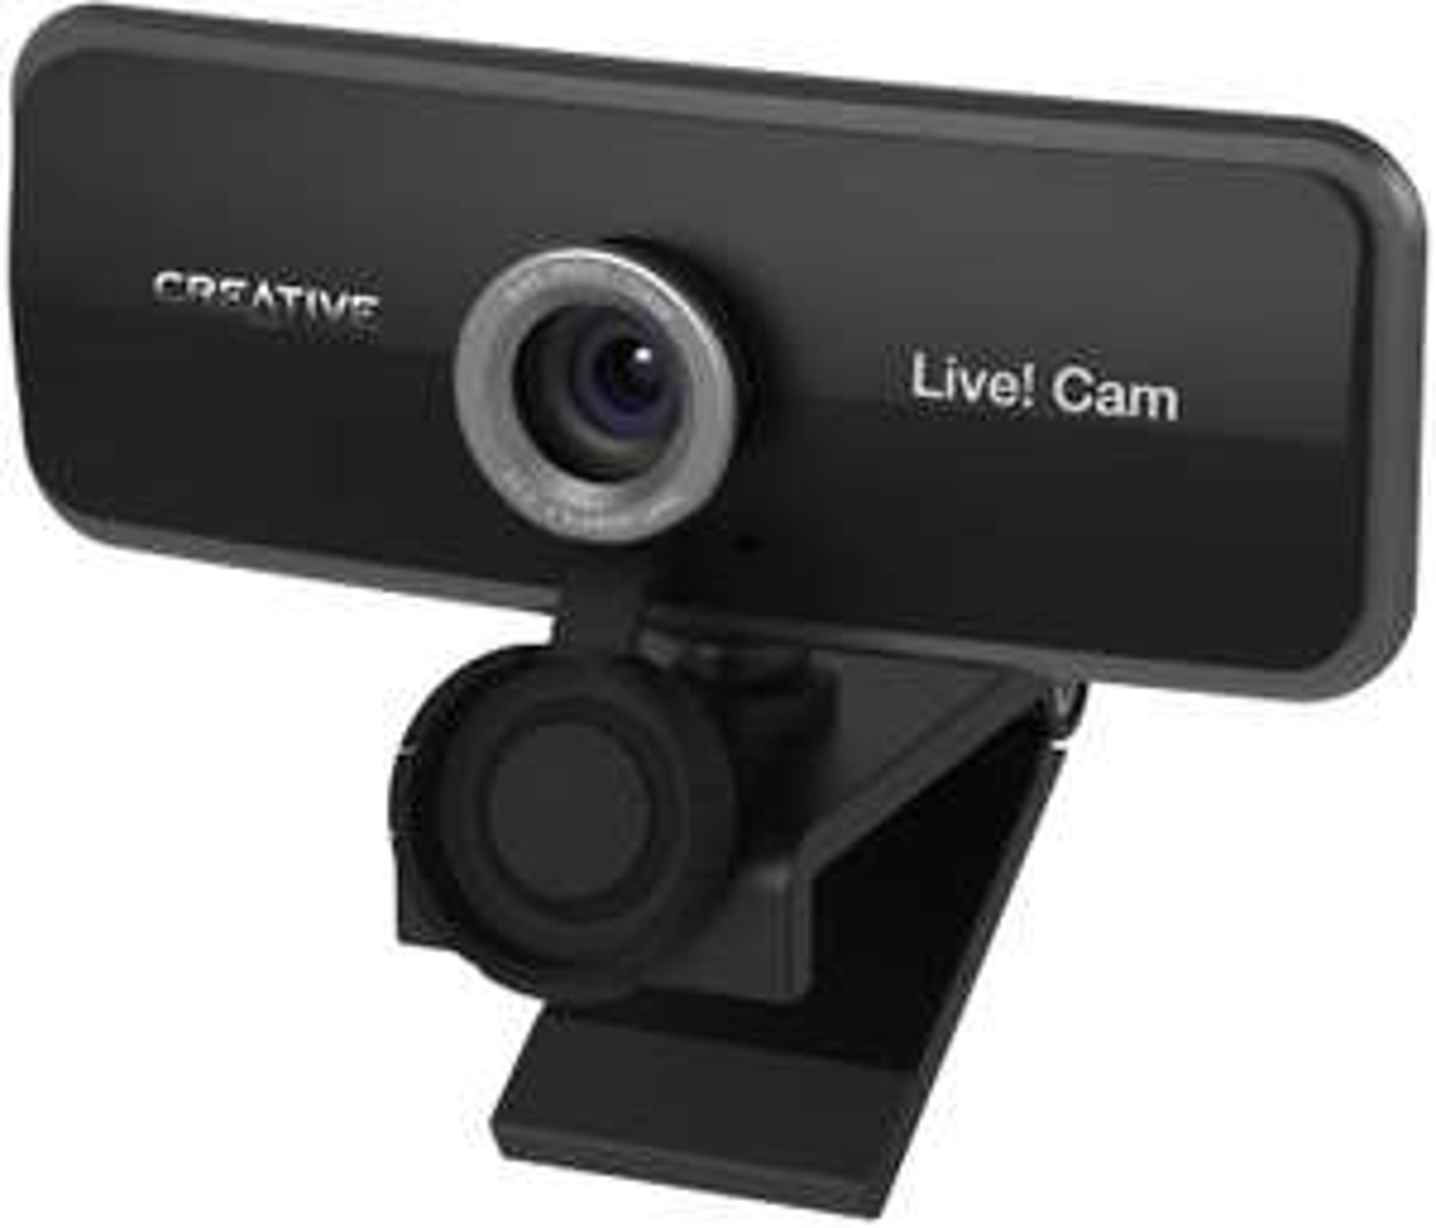 CREATIVE Live! Cam Sync 1080p - Full HD-Weitwinkel-Webcam mit integriertem Dual-Mikrofon